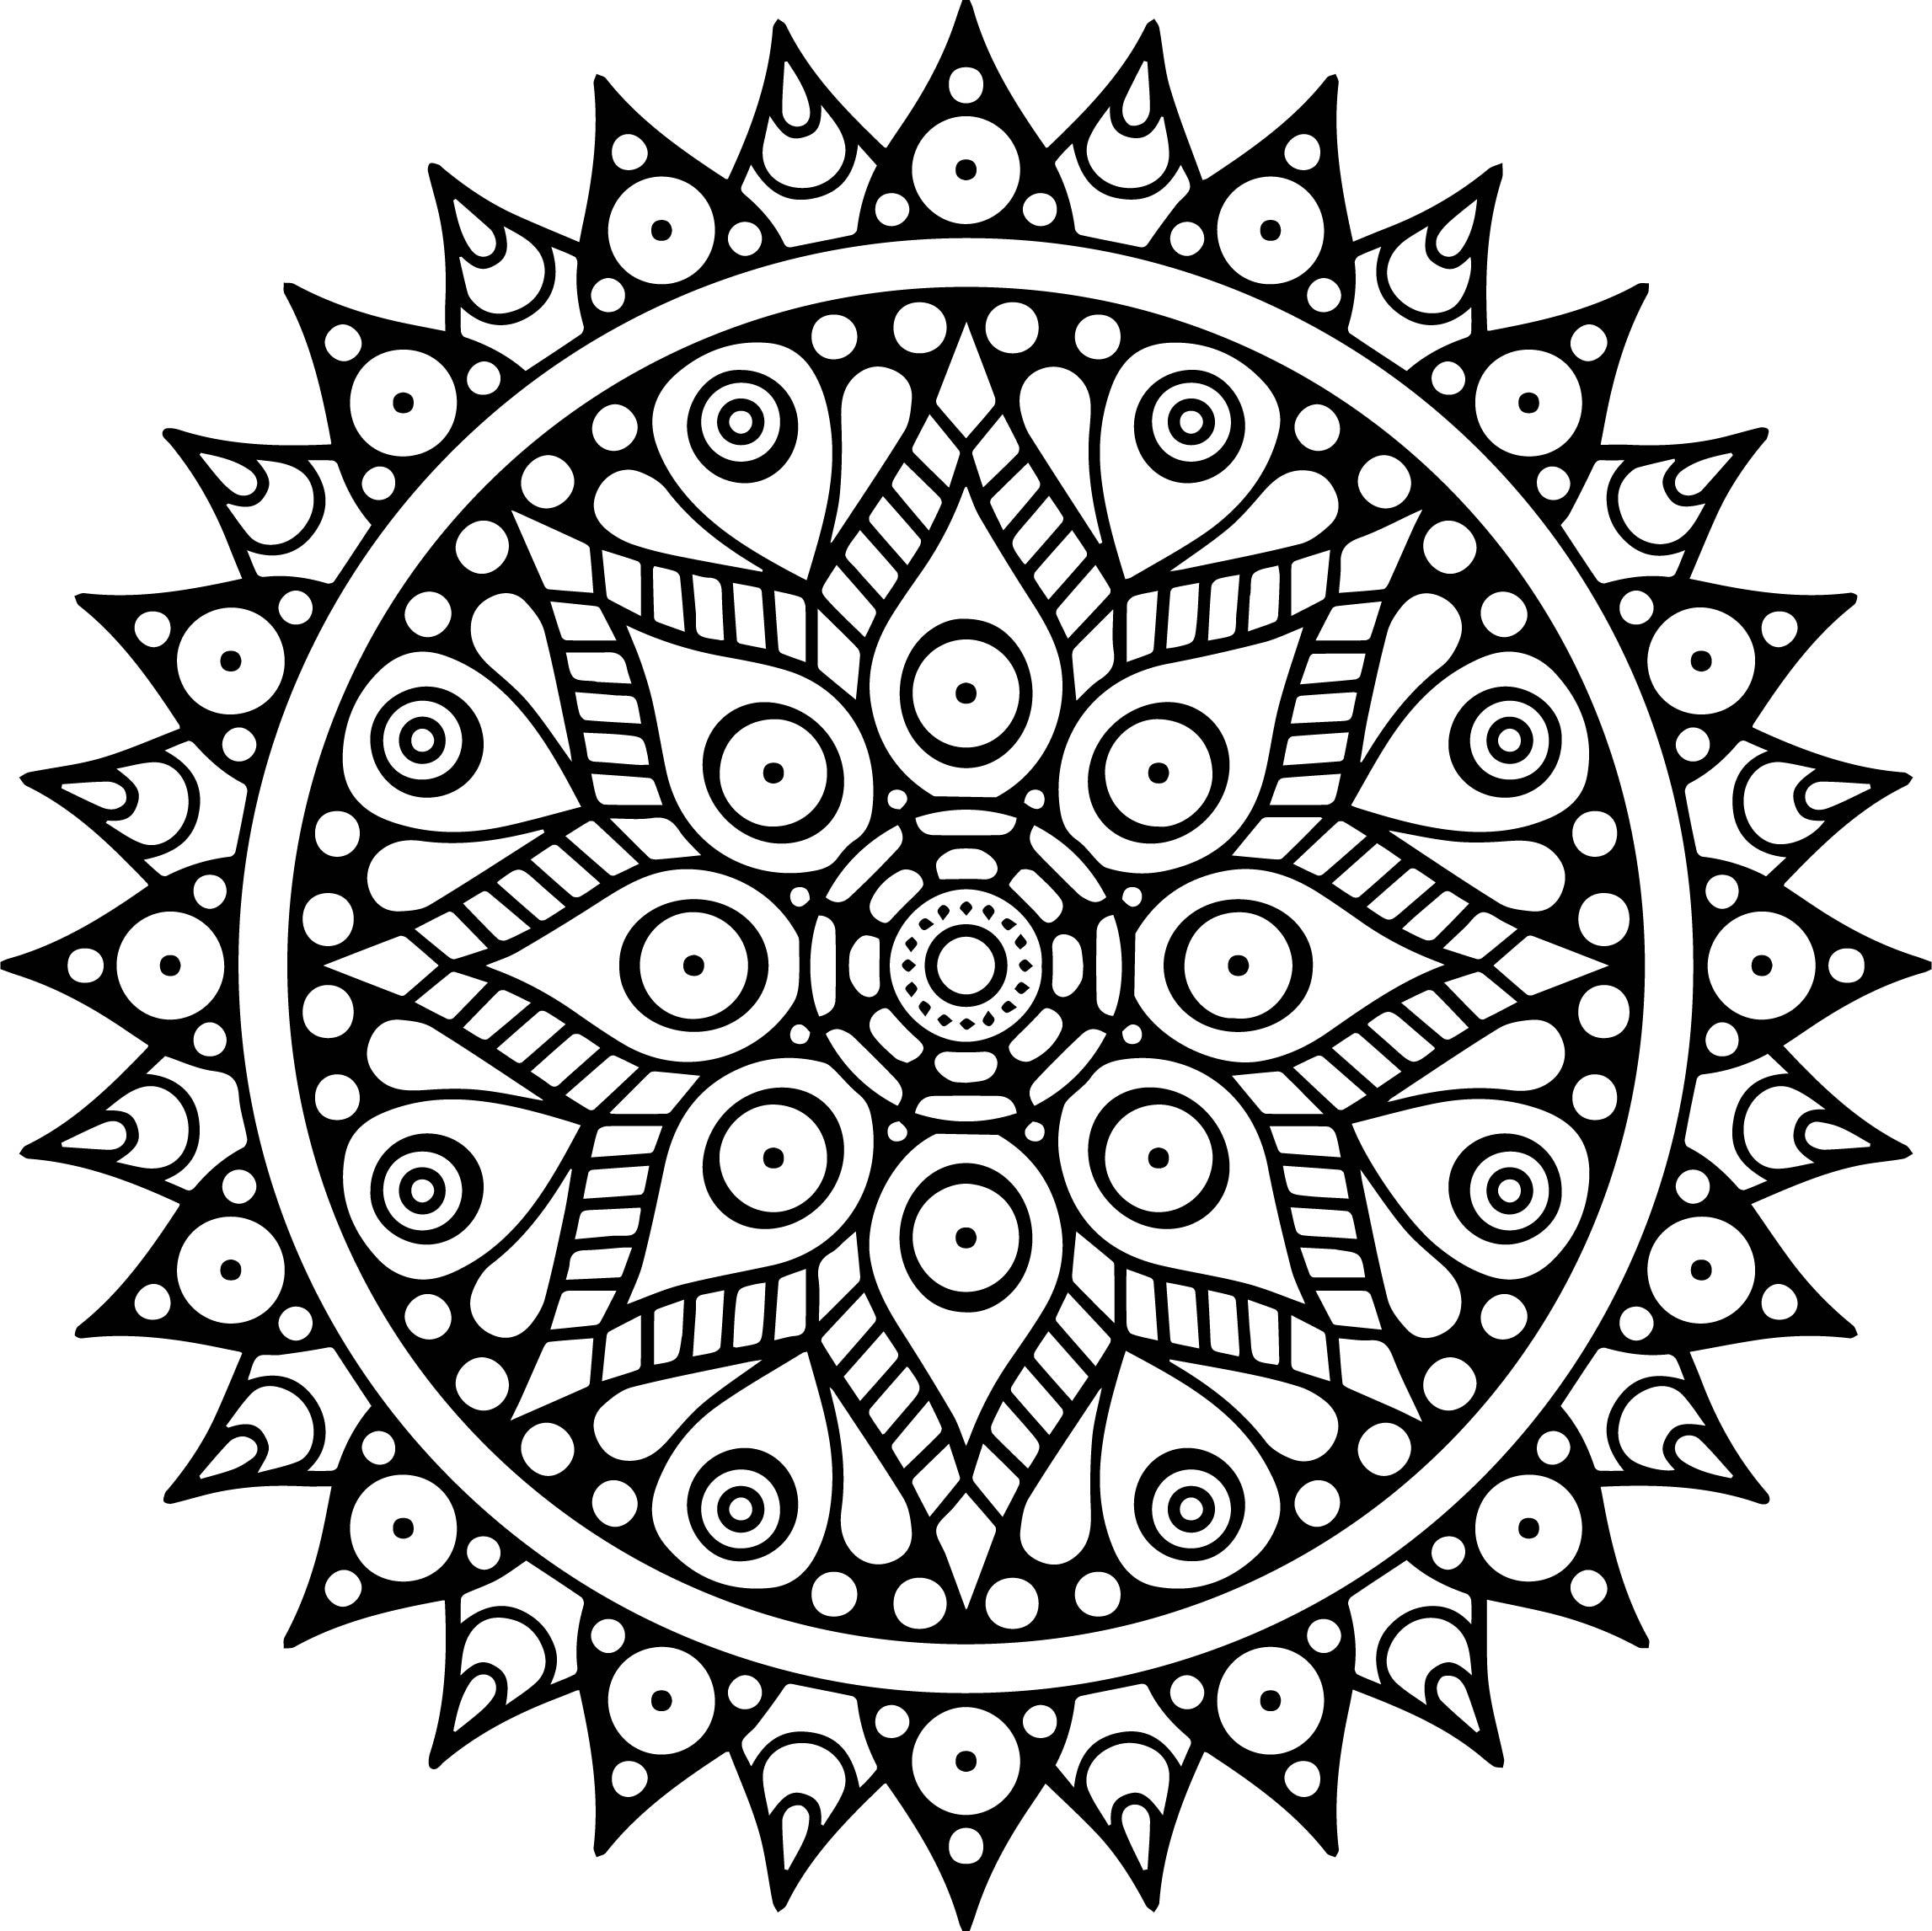 Mandala Buddhism Icon Multicolored Mandala Coloring Page ...